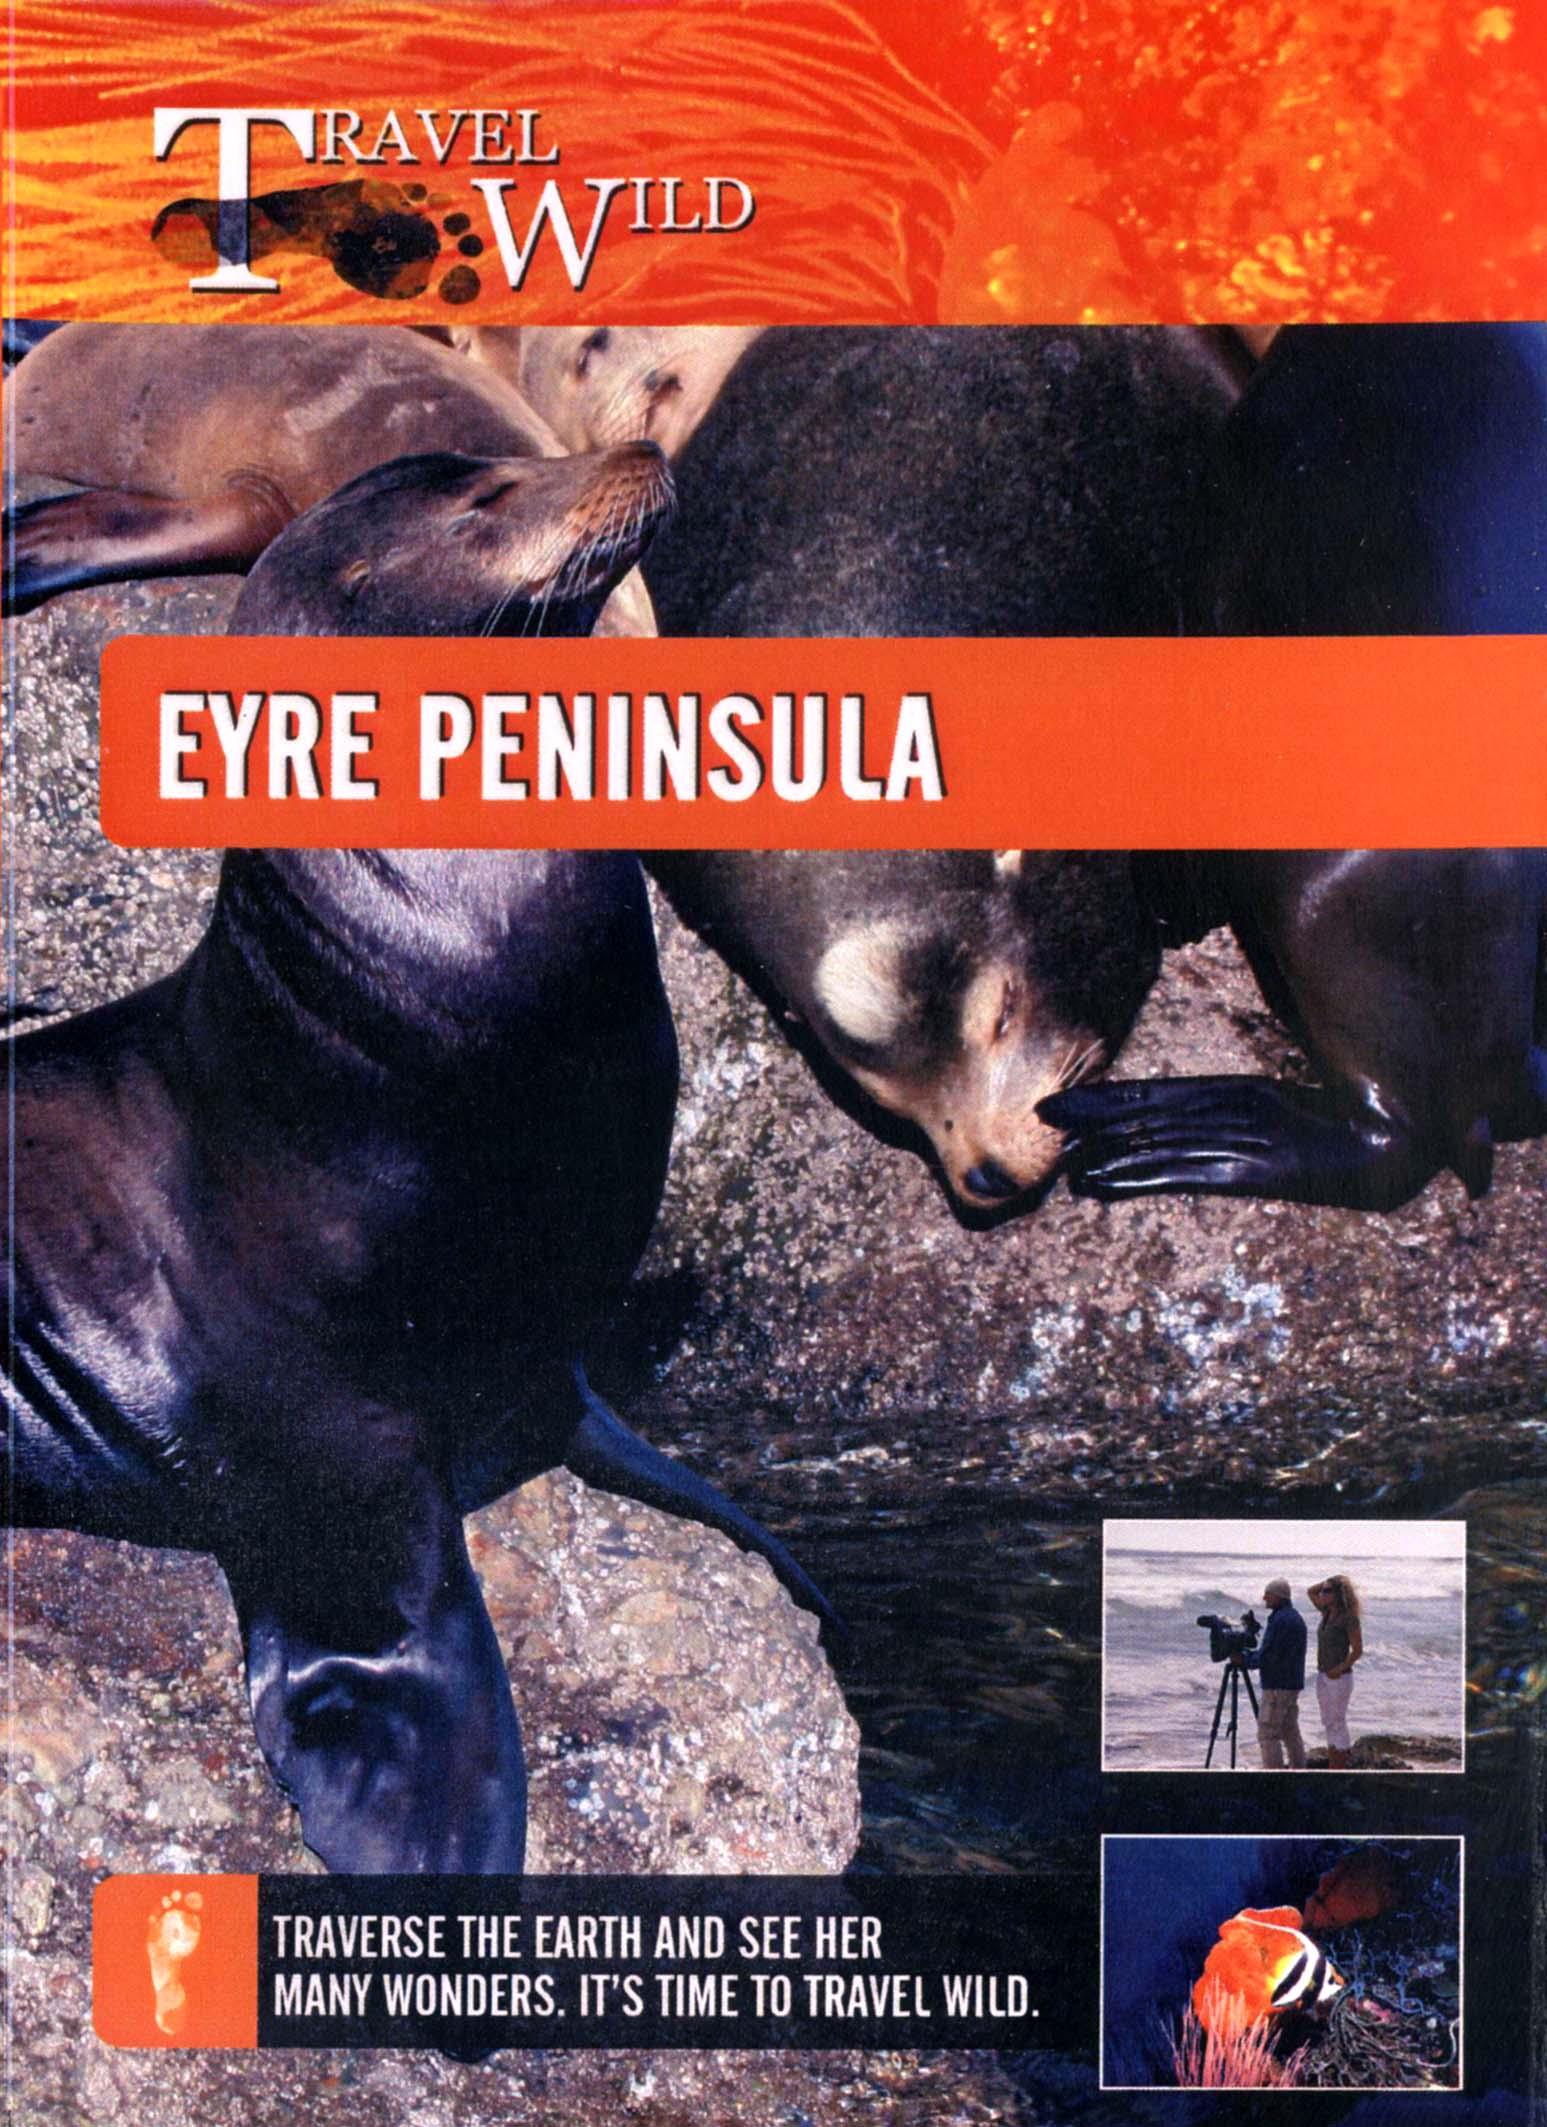 Travel Wild: Eyre Peninsula